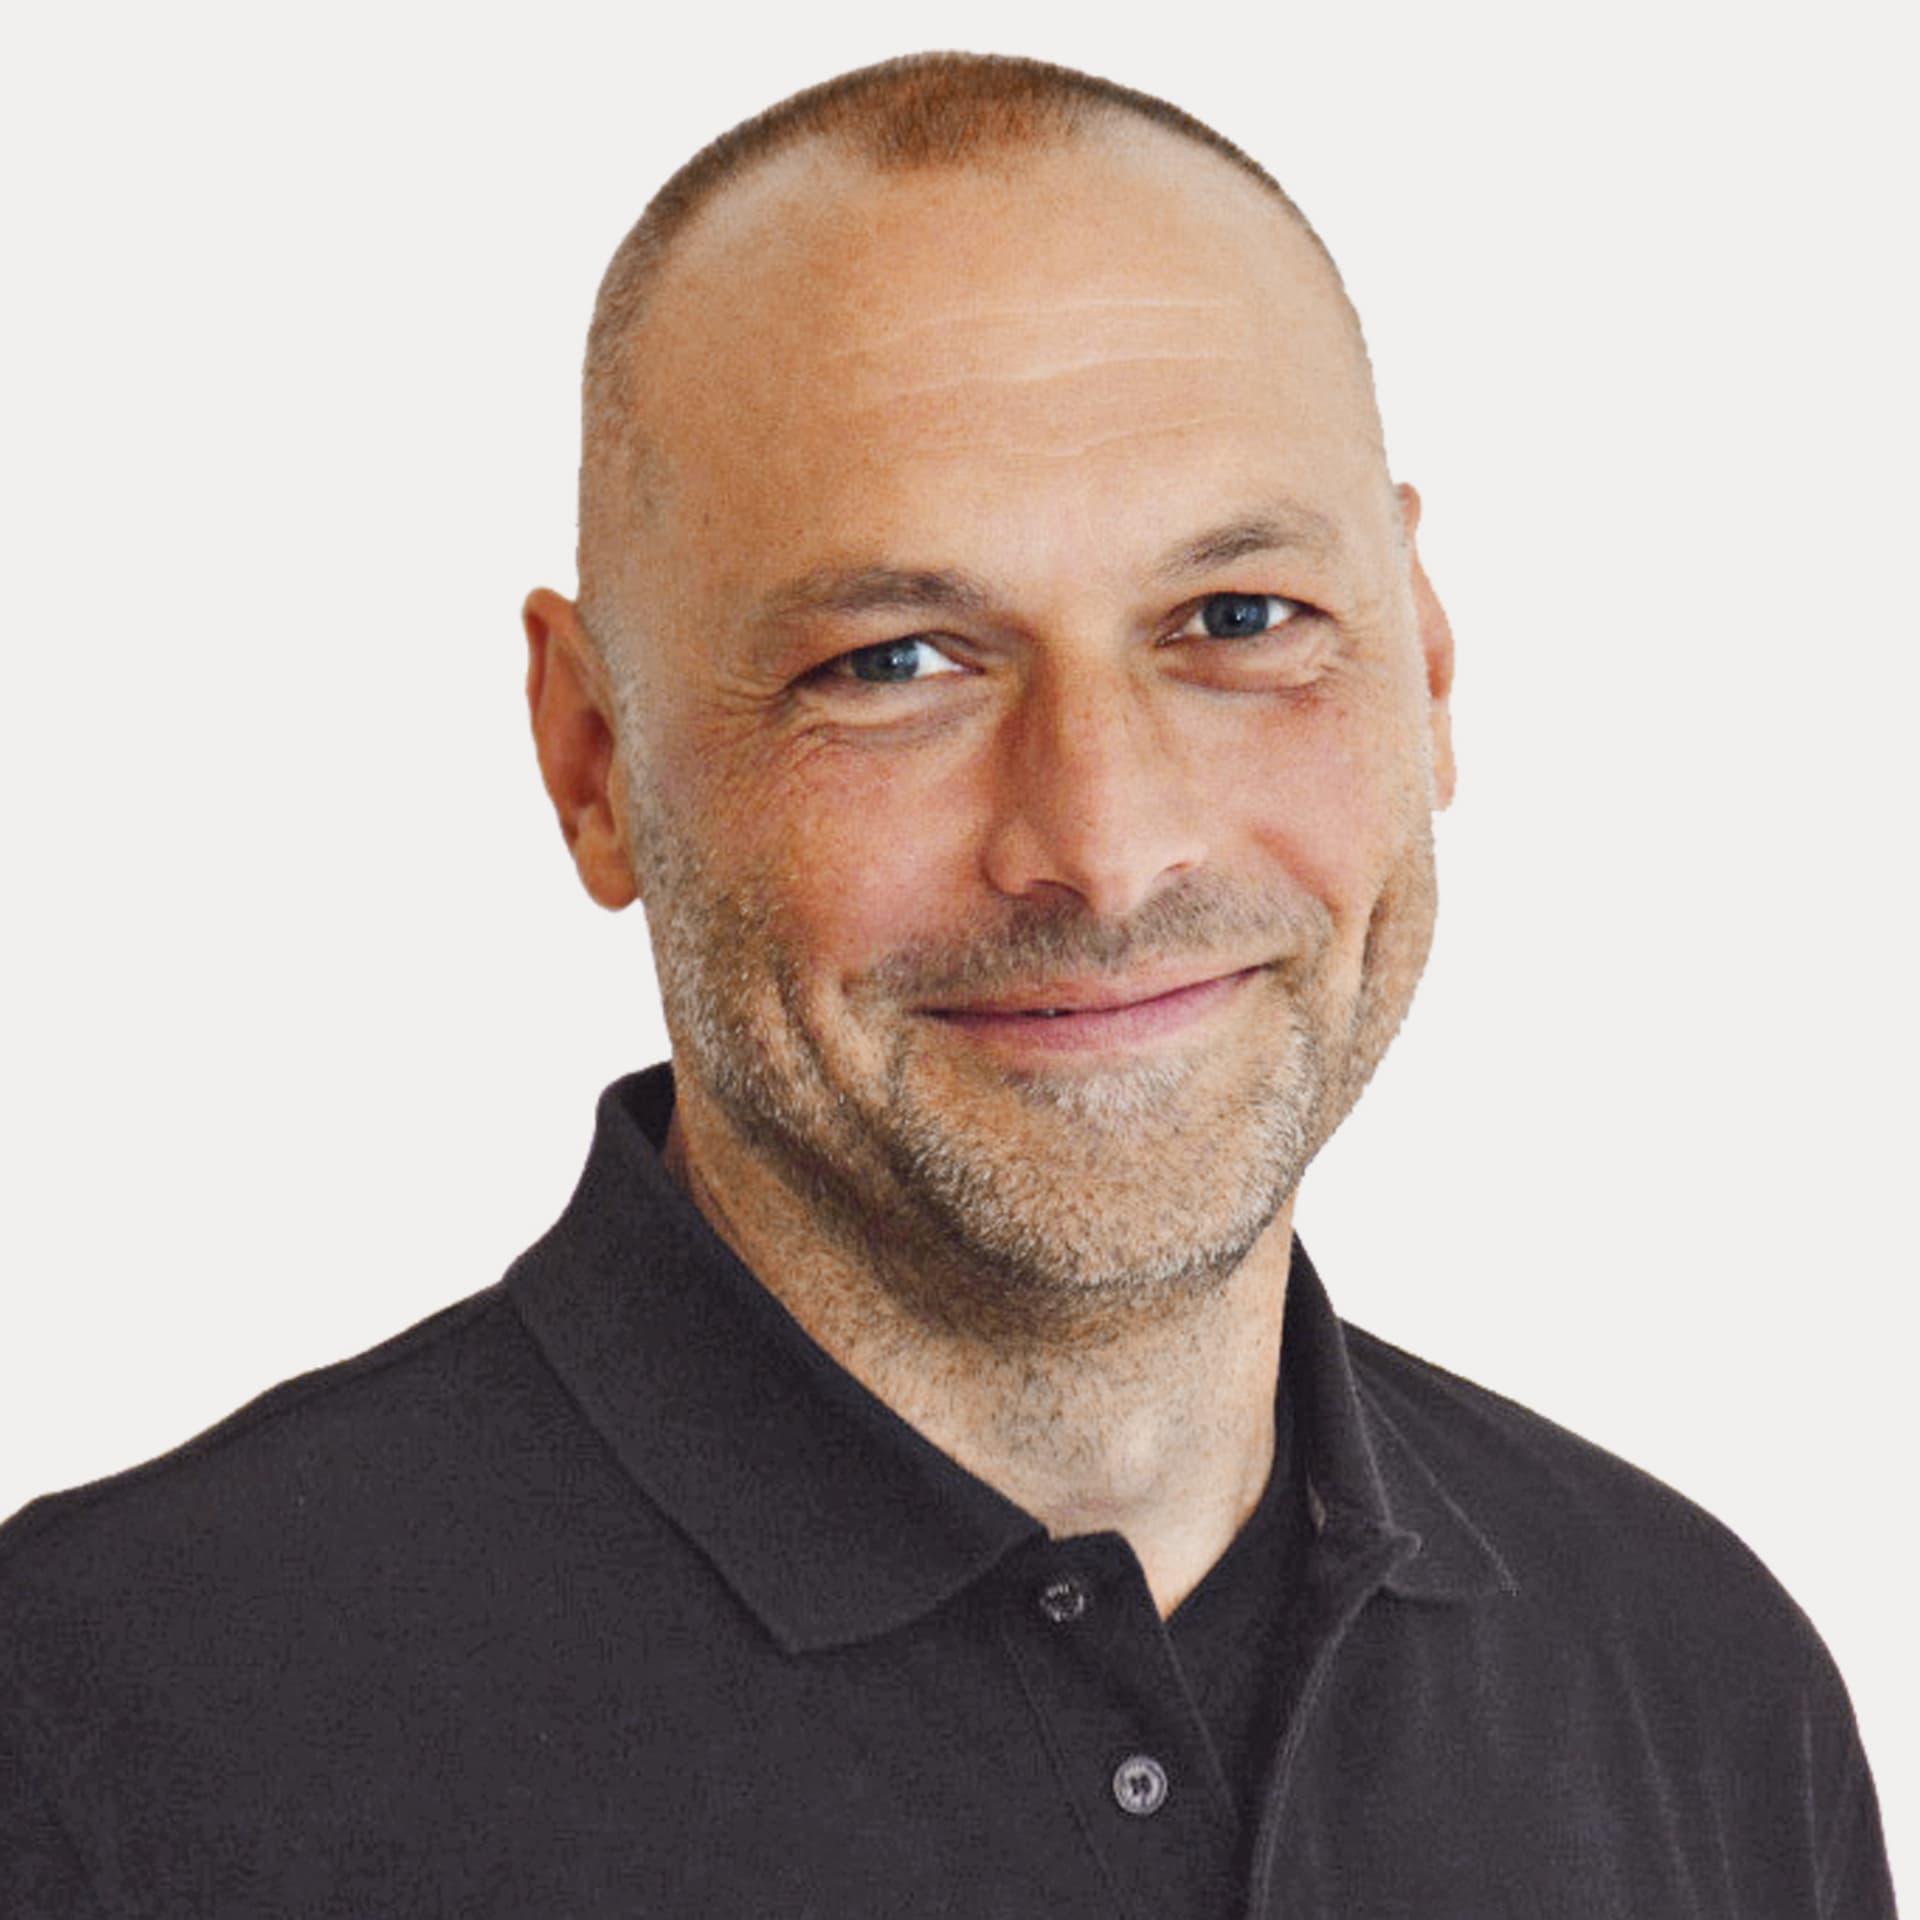 Christoph Spahn